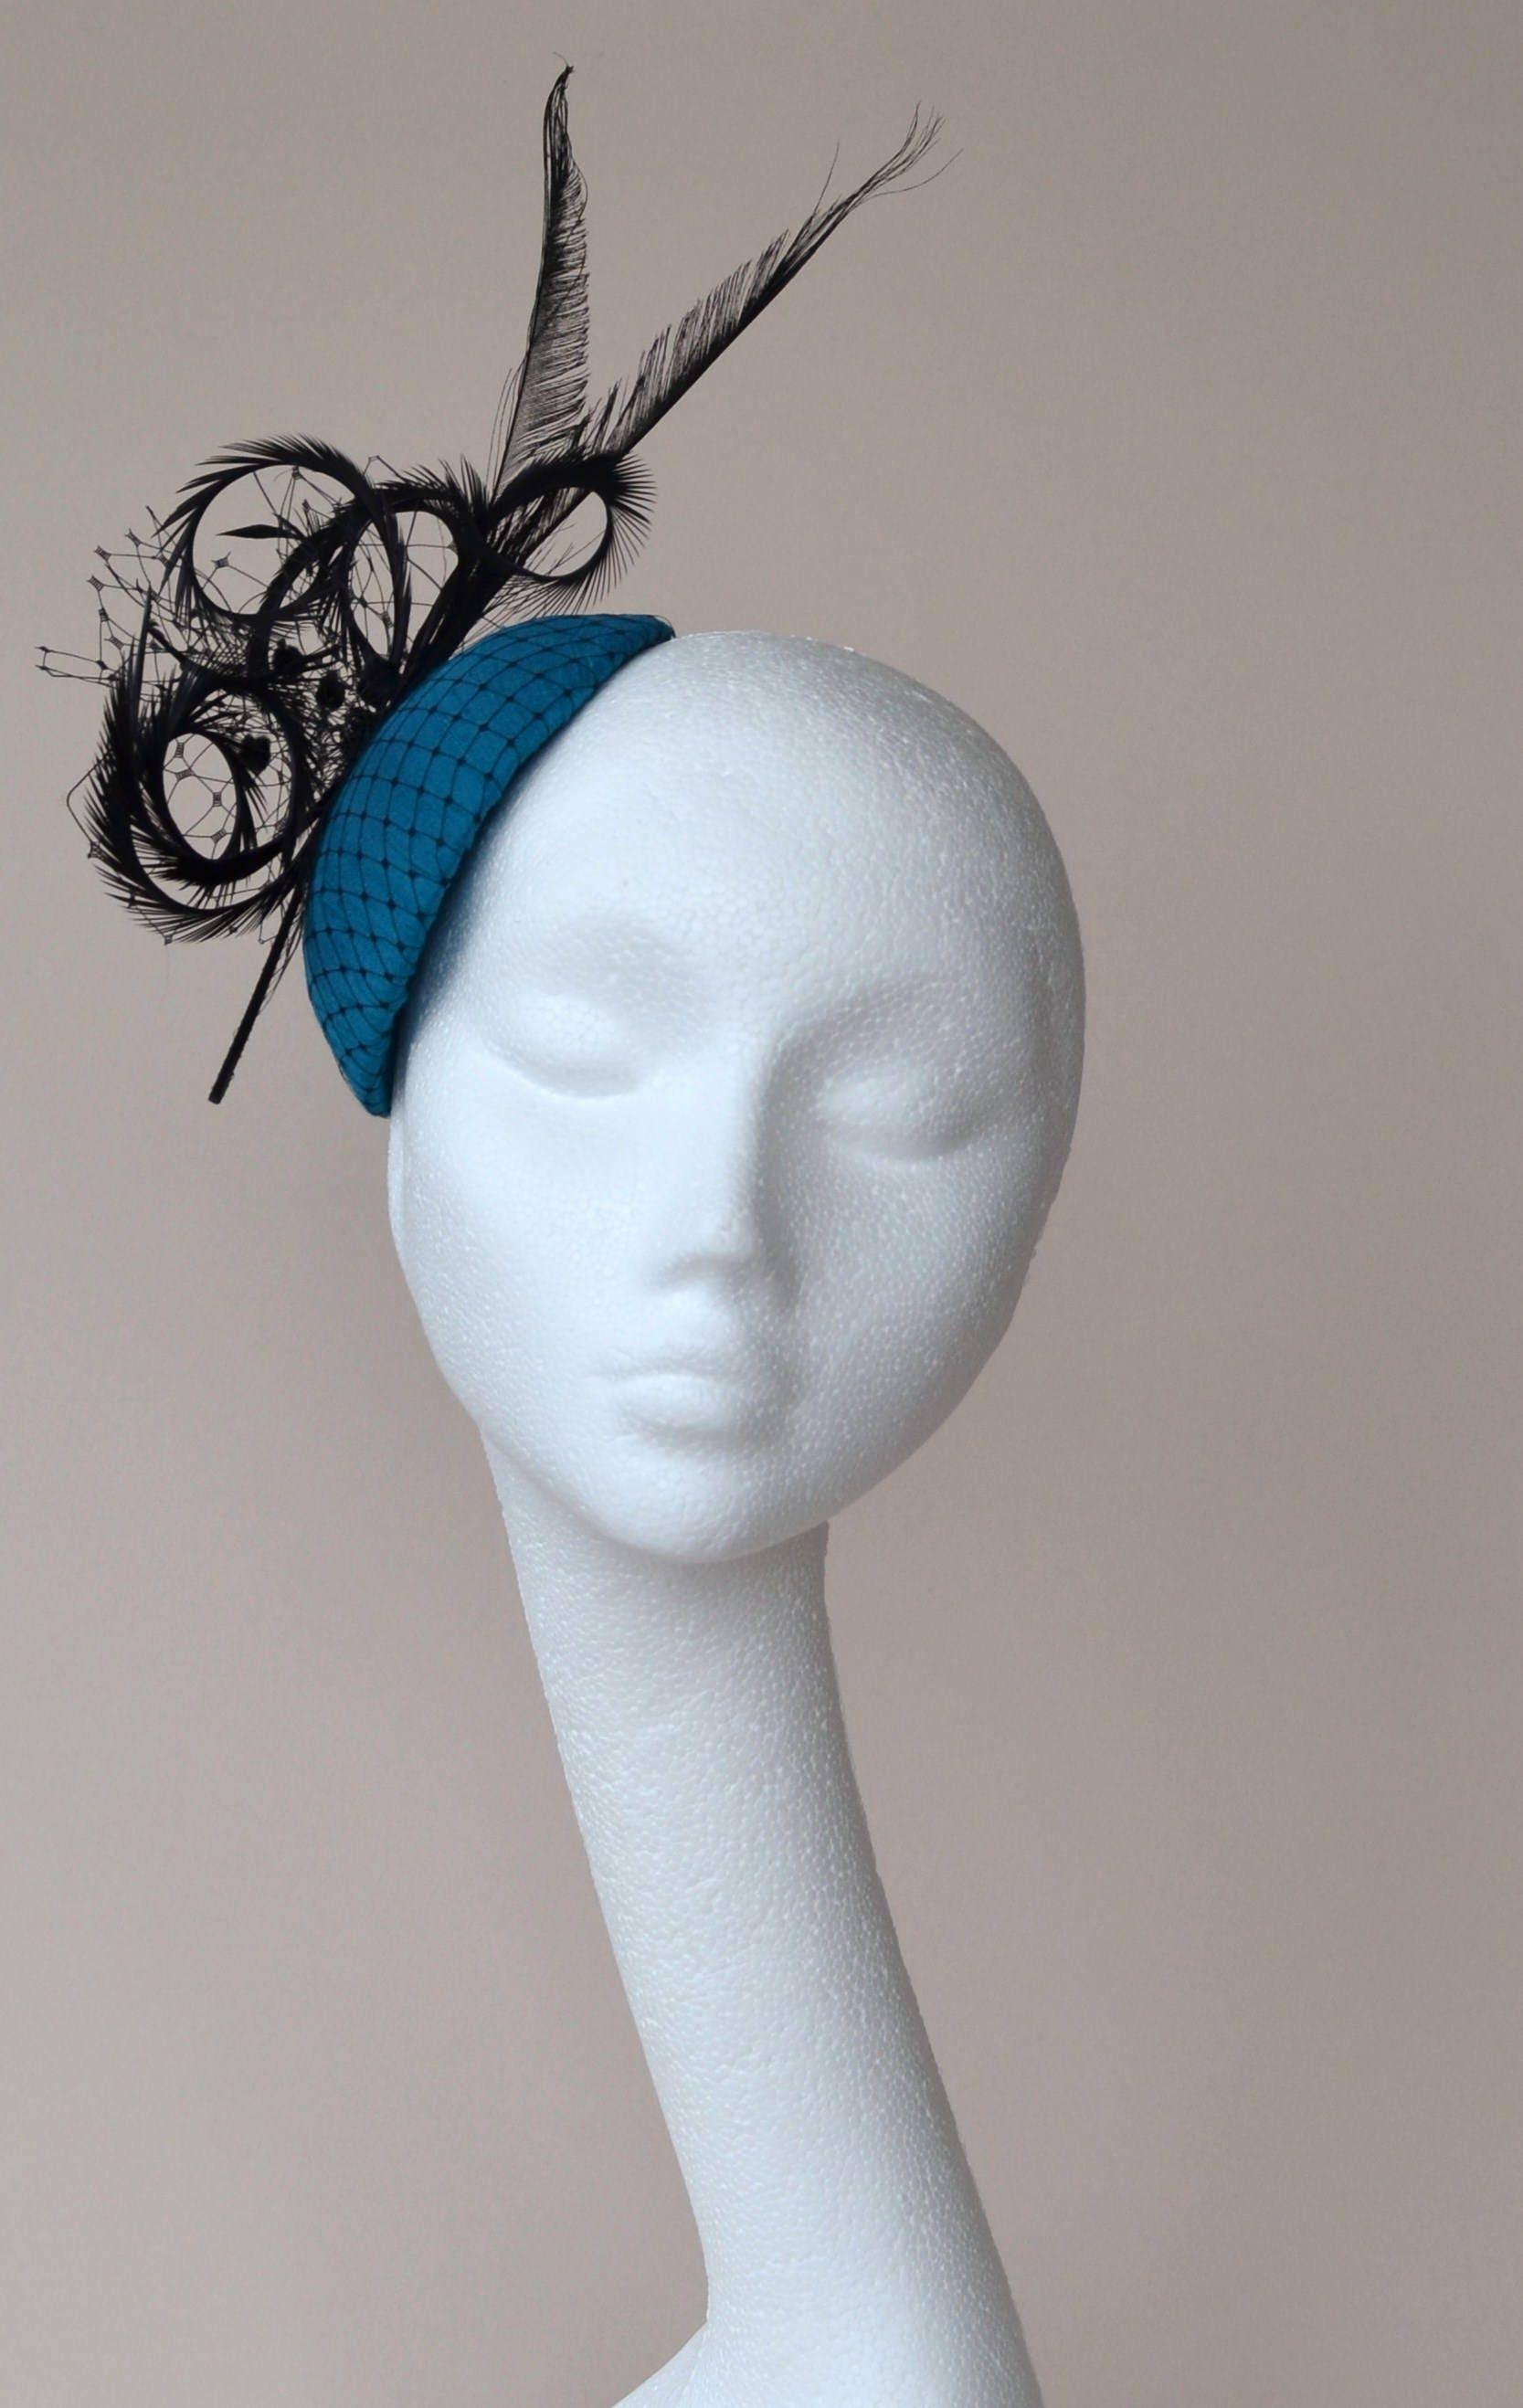 Blue fascinator. Turquoise fascinator. Blue wedding hat. Turquoise Ascot hat. Teal Derby hat. Teal black fascinator. Turquoise percher hat.